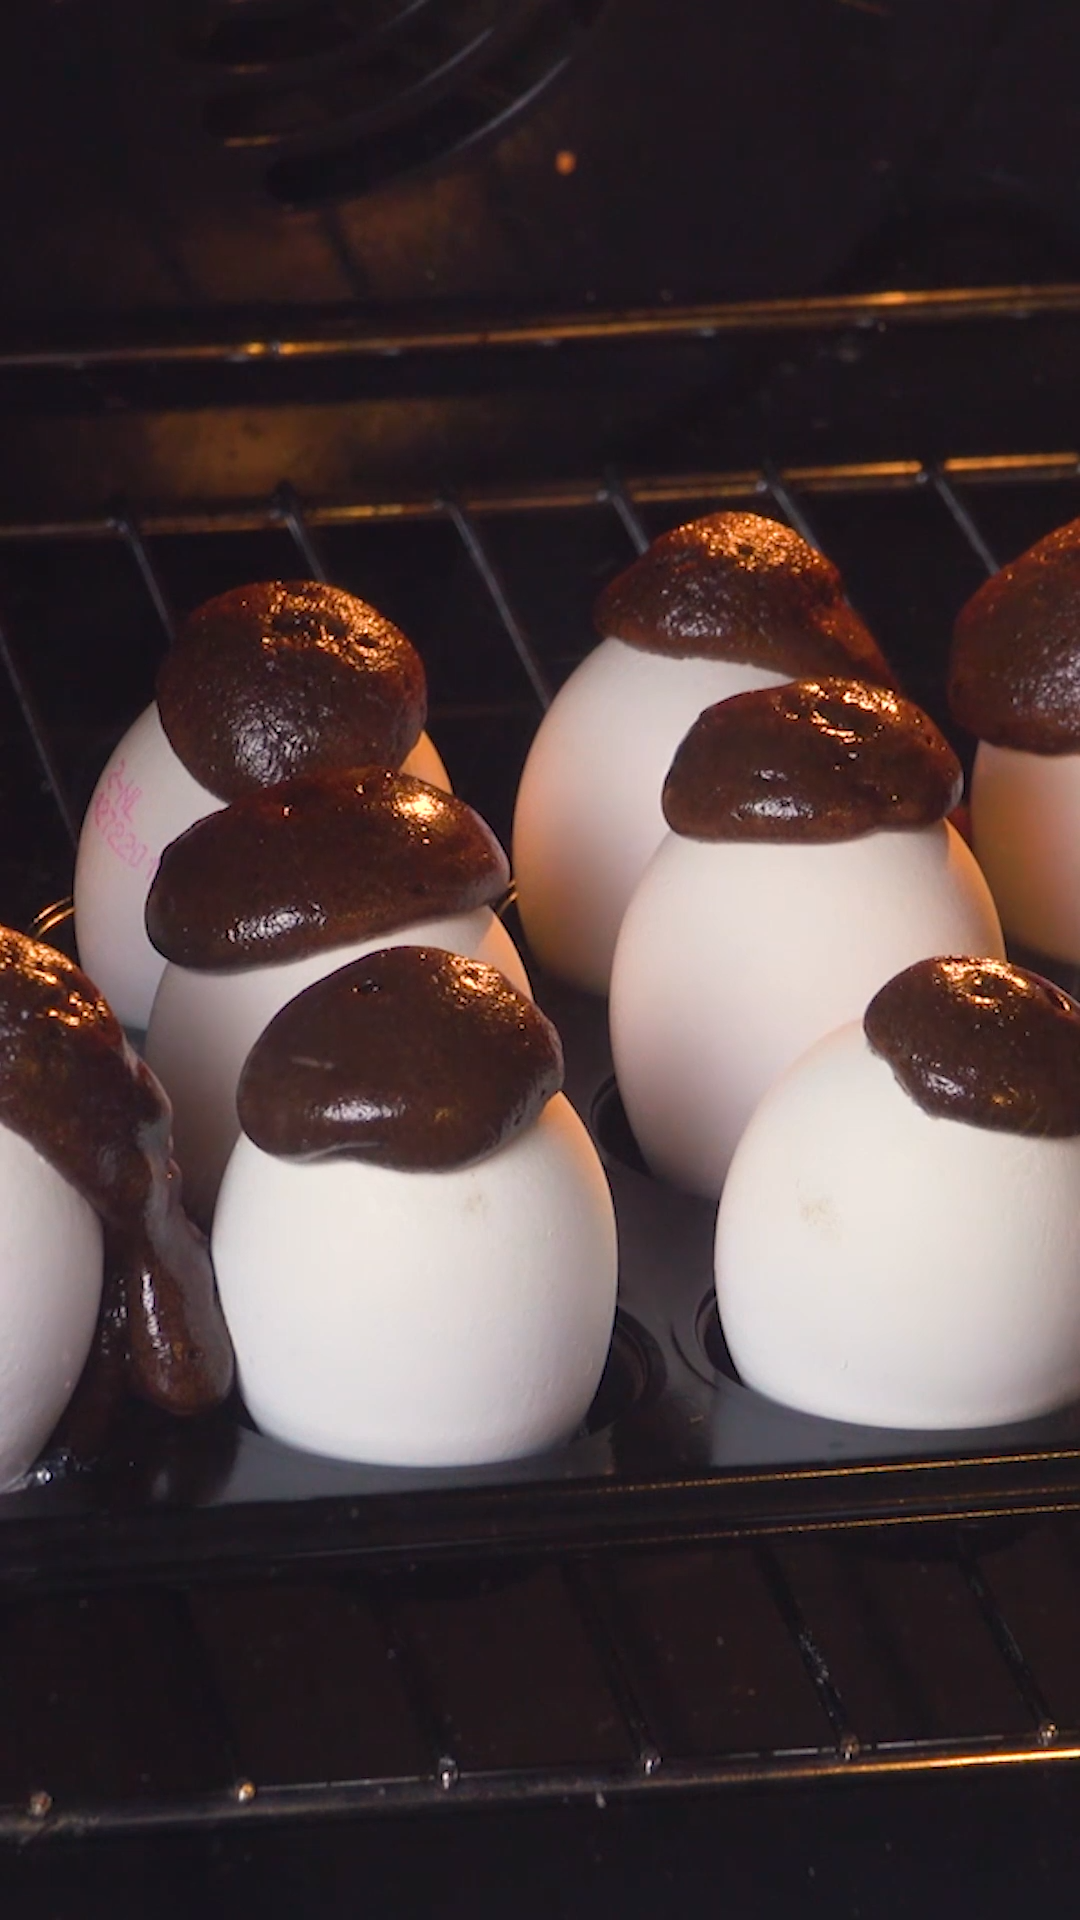 2 schoko-geniale Ostereier, die du selbst legst